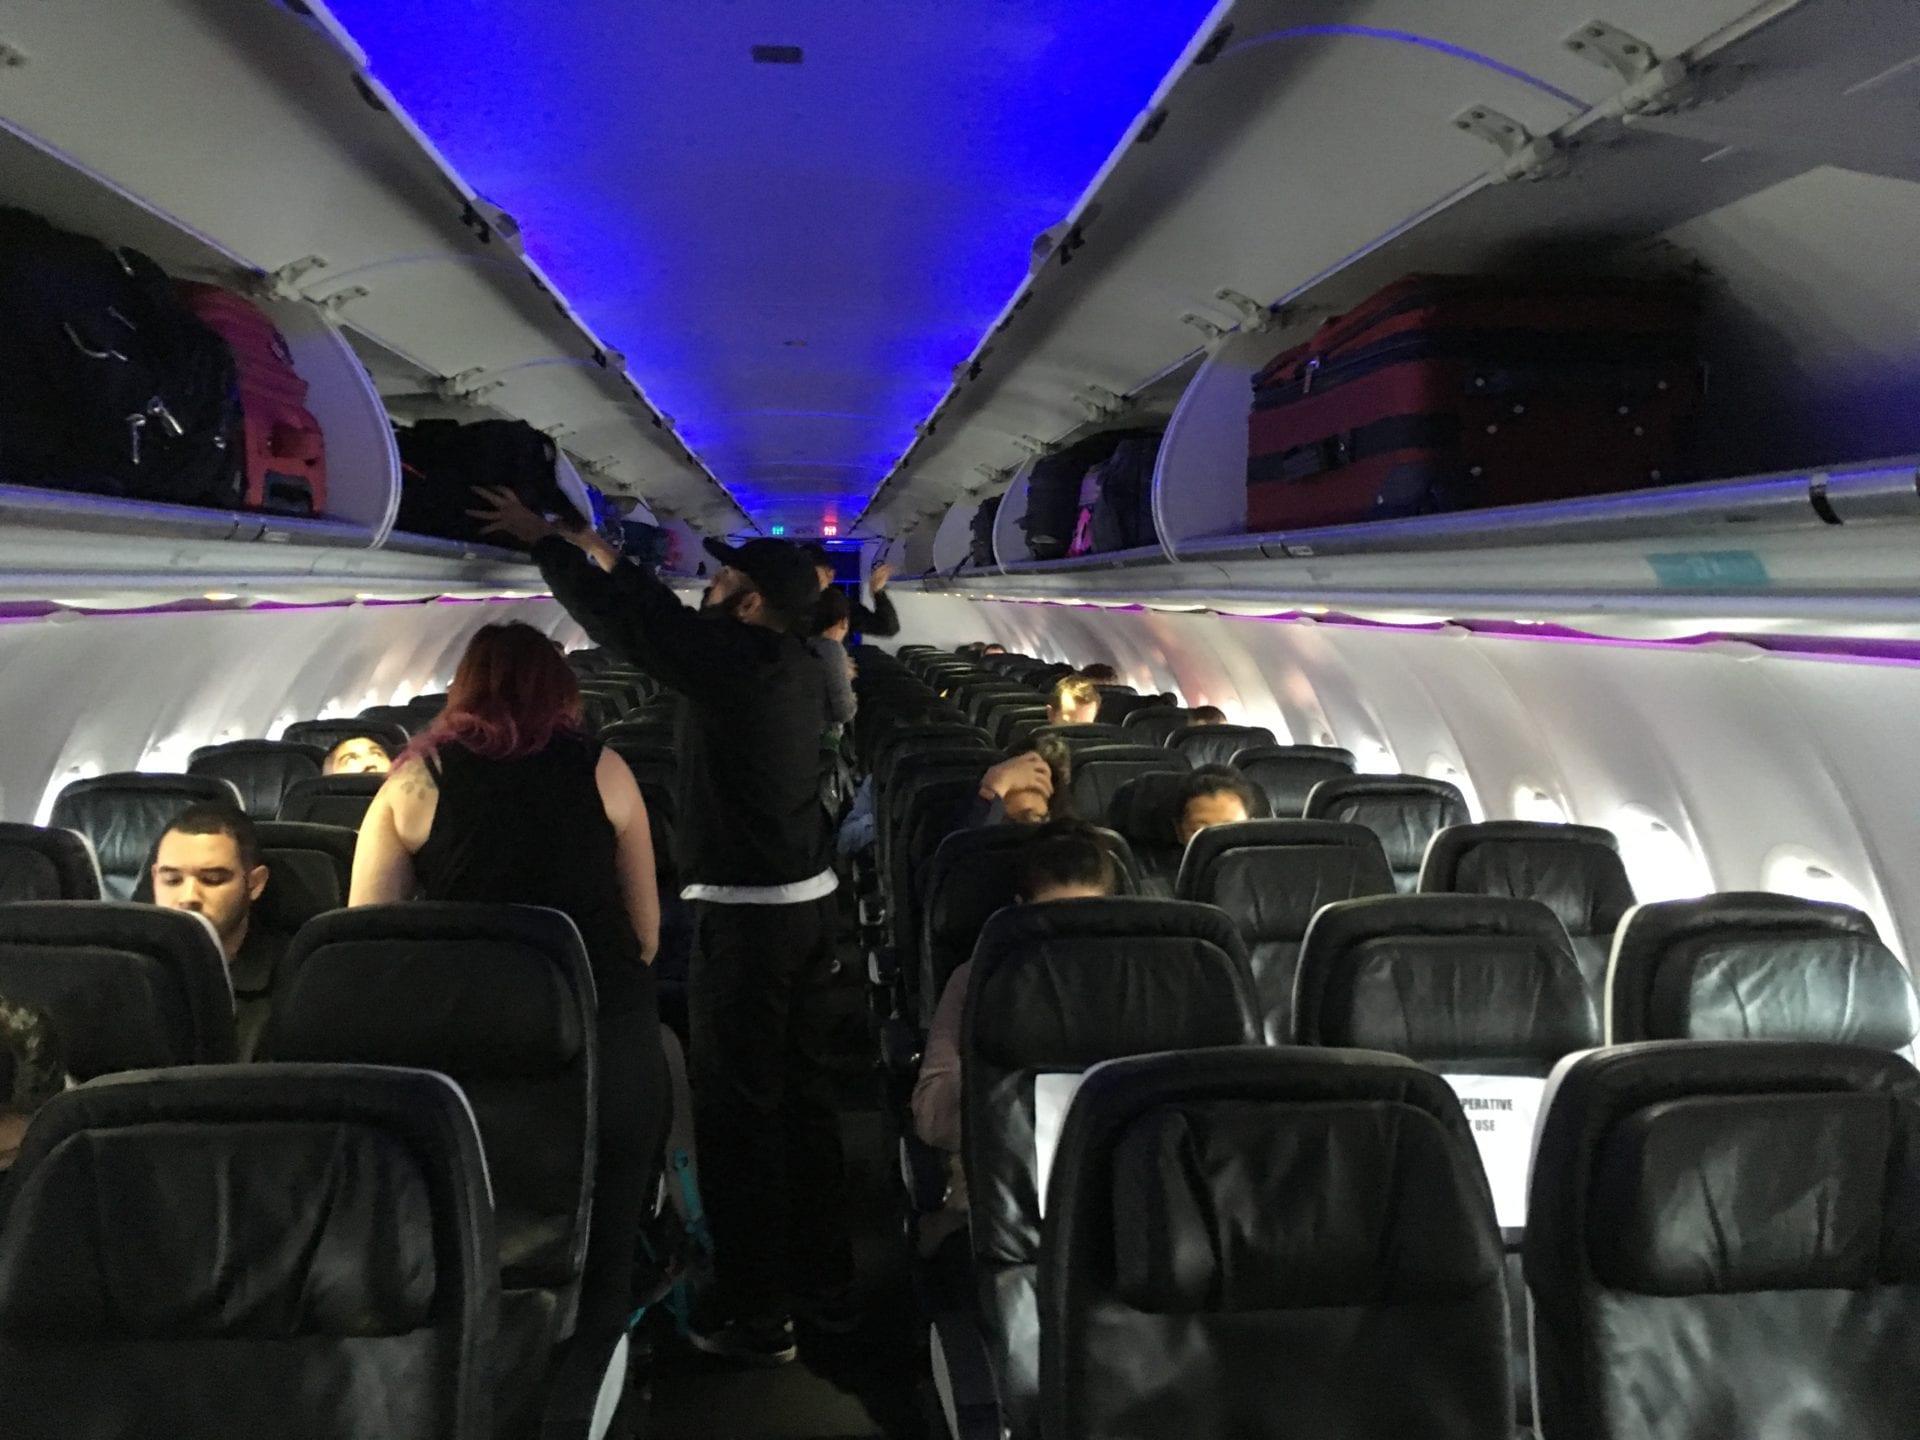 Alaska Airlines Economy Class Kabine